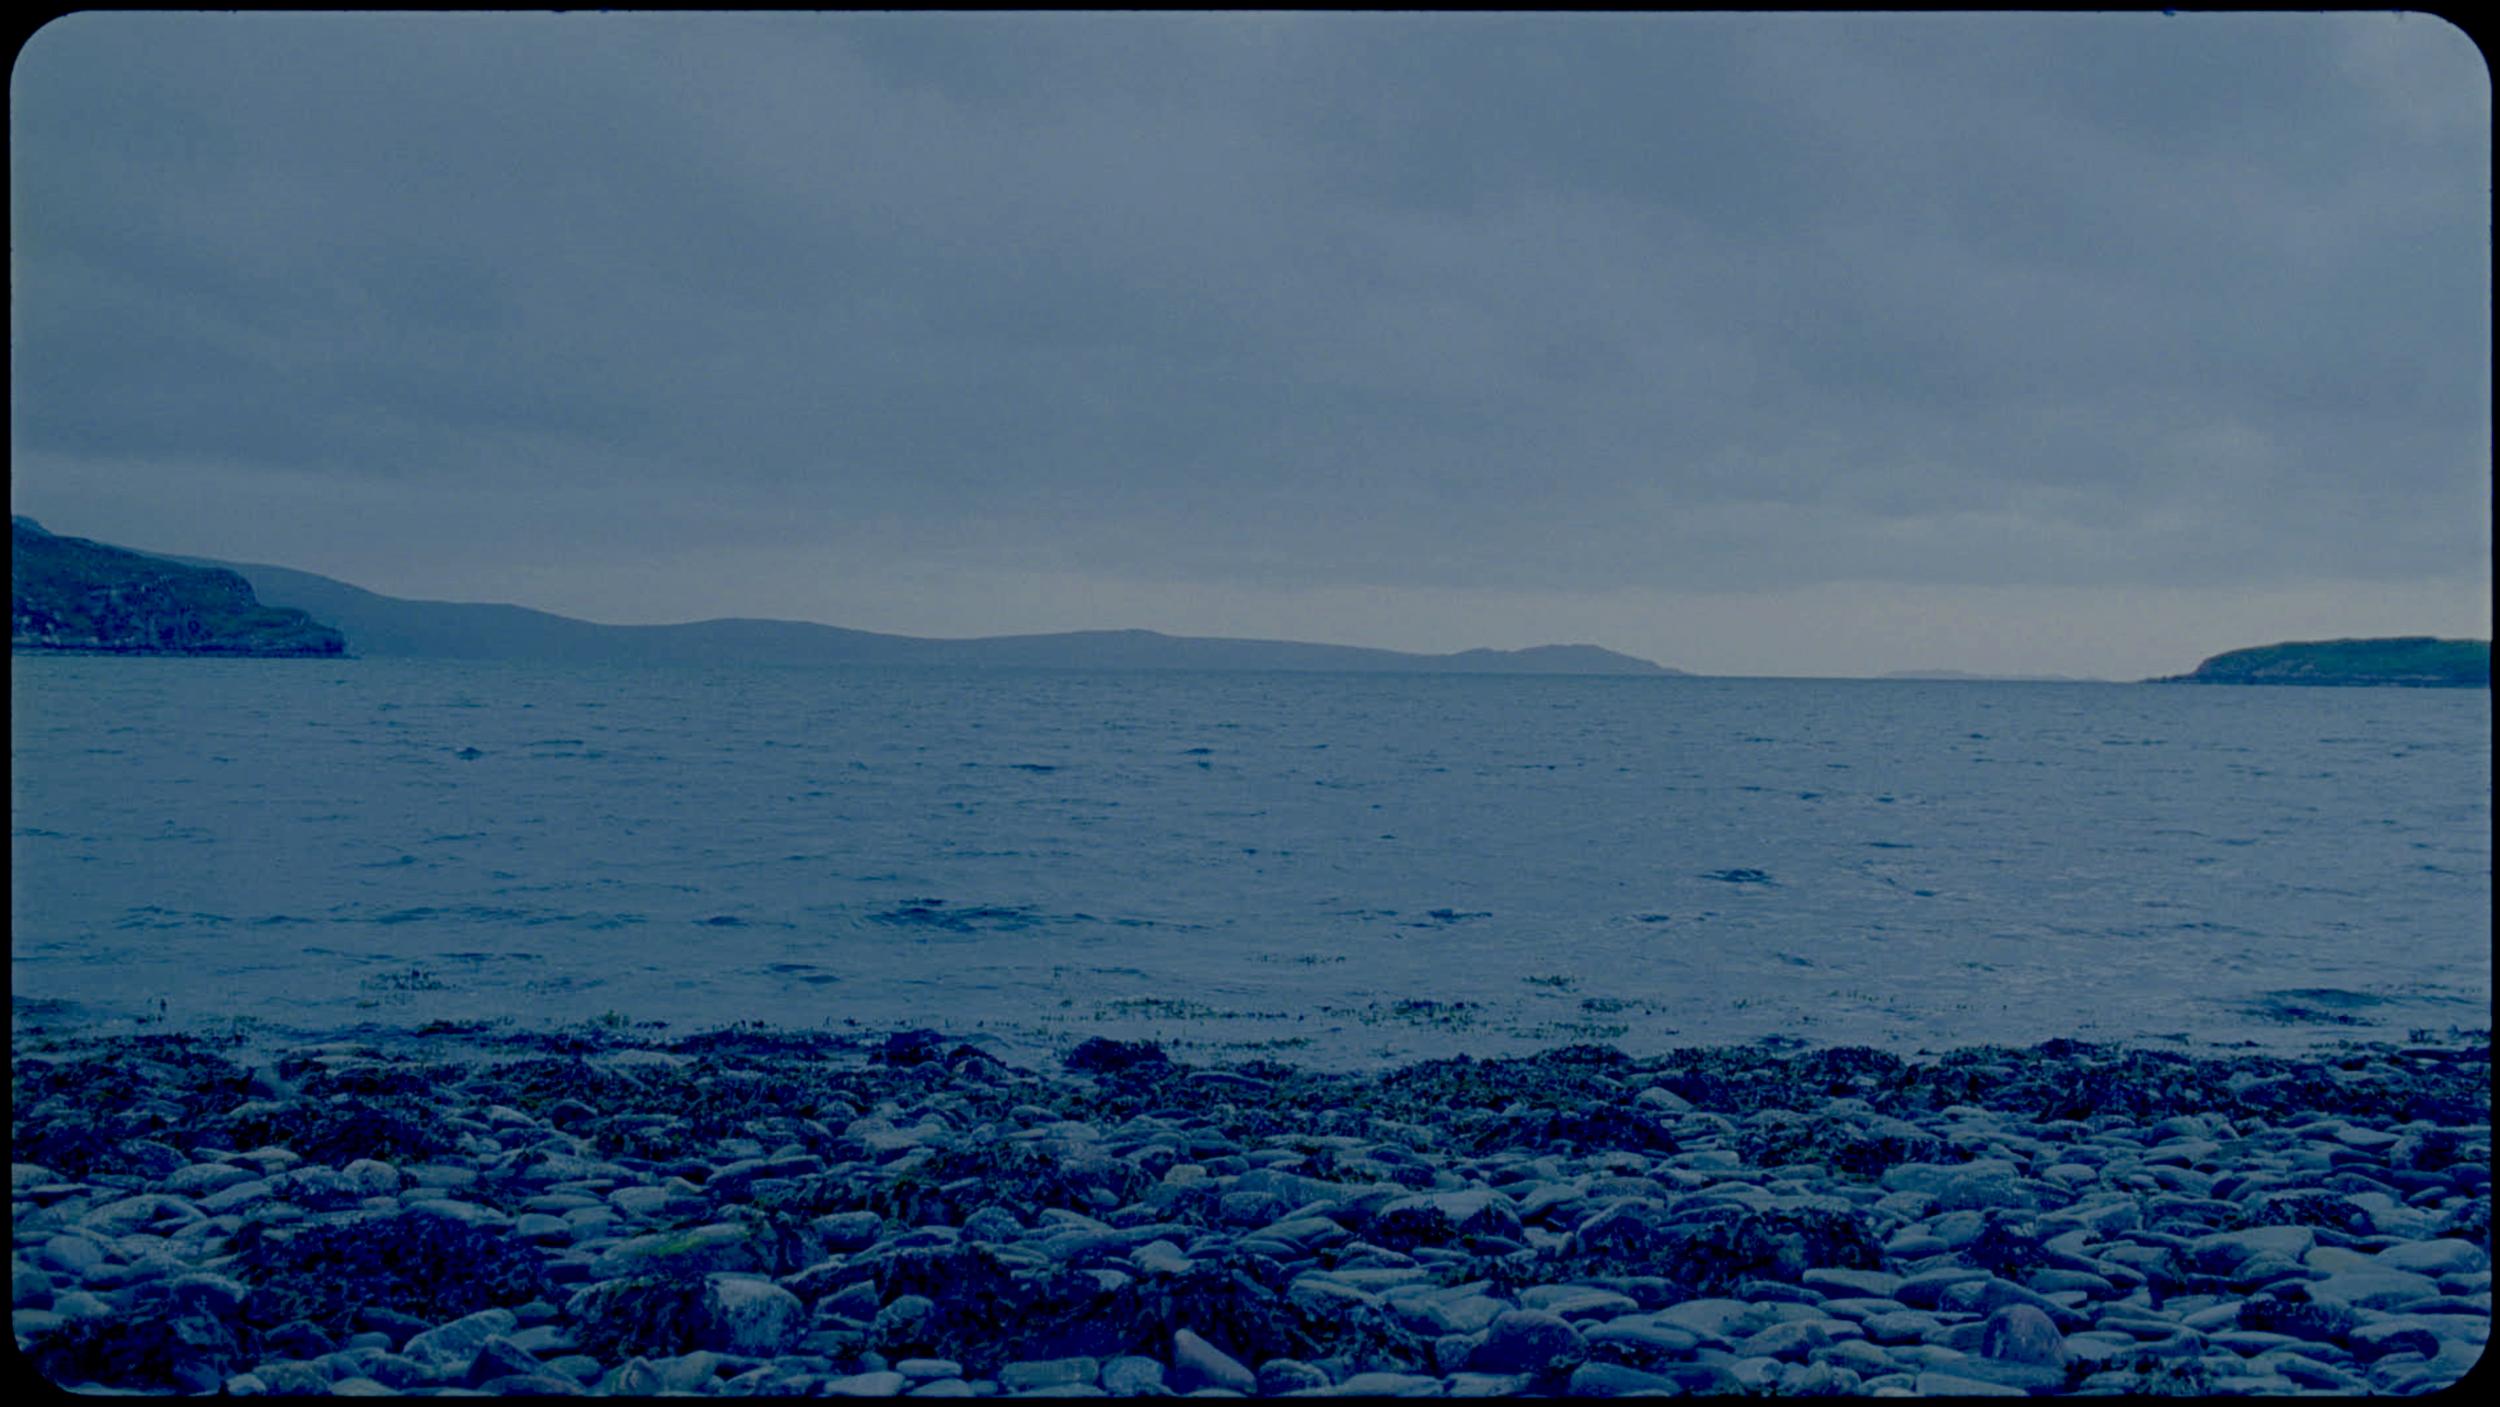 Shoreline from 'Cladach'